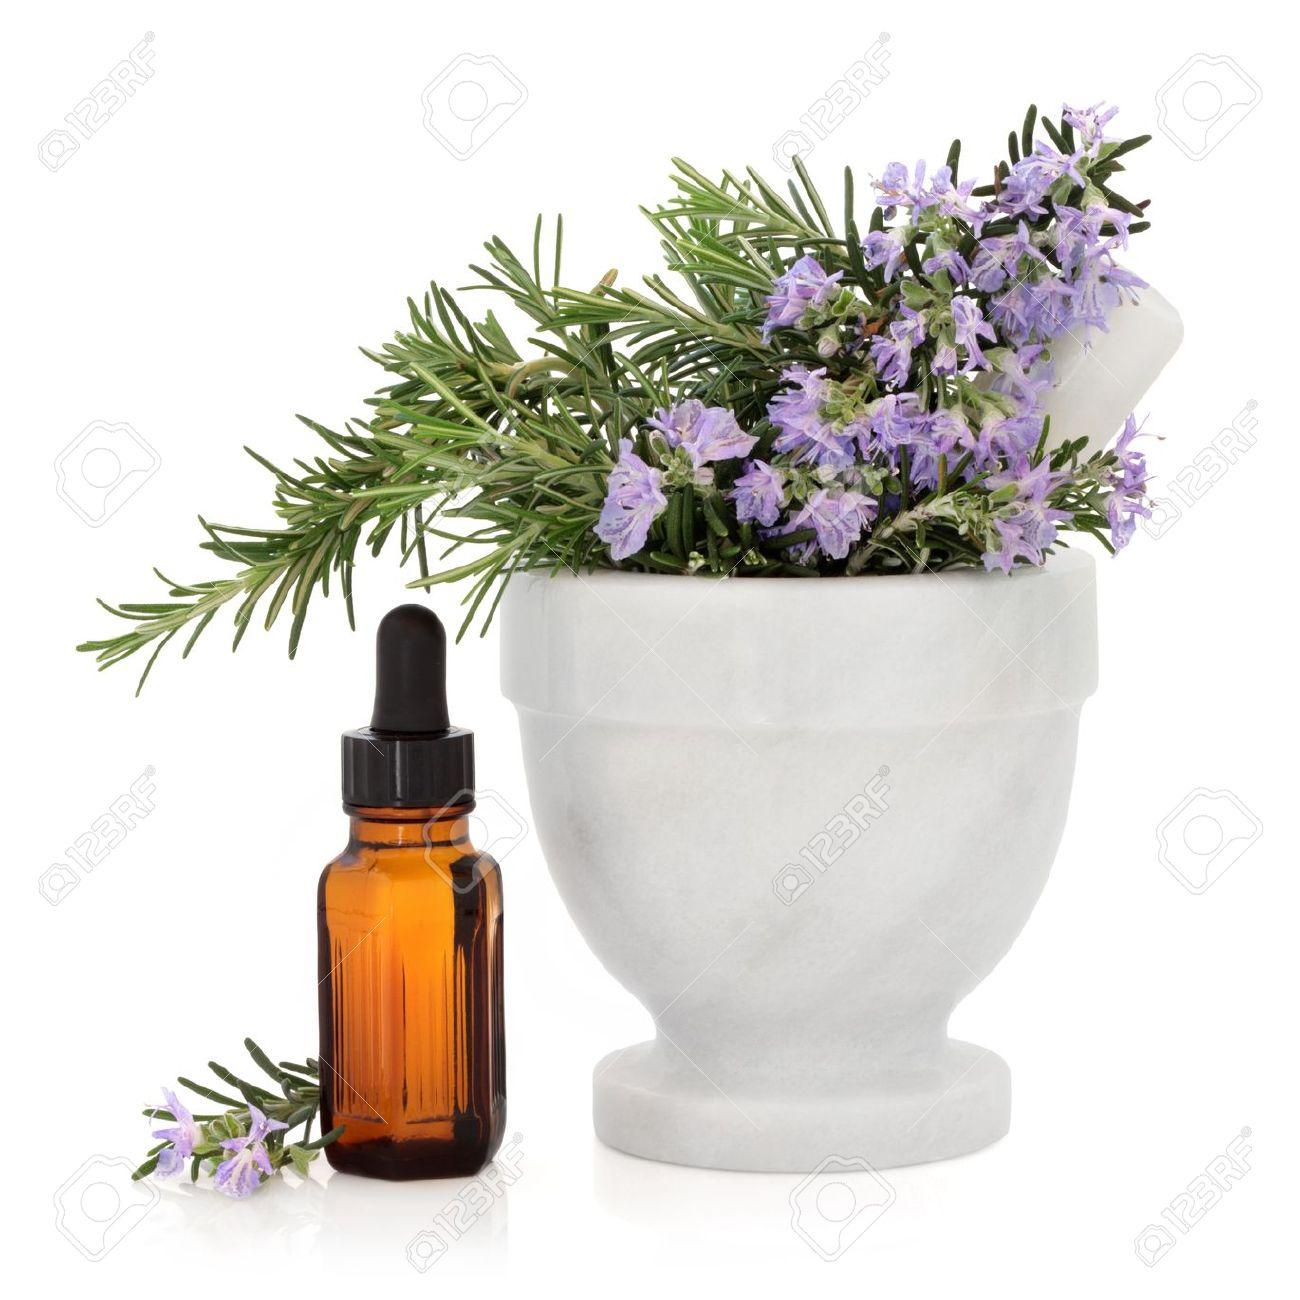 Aromatherapy clipart free.